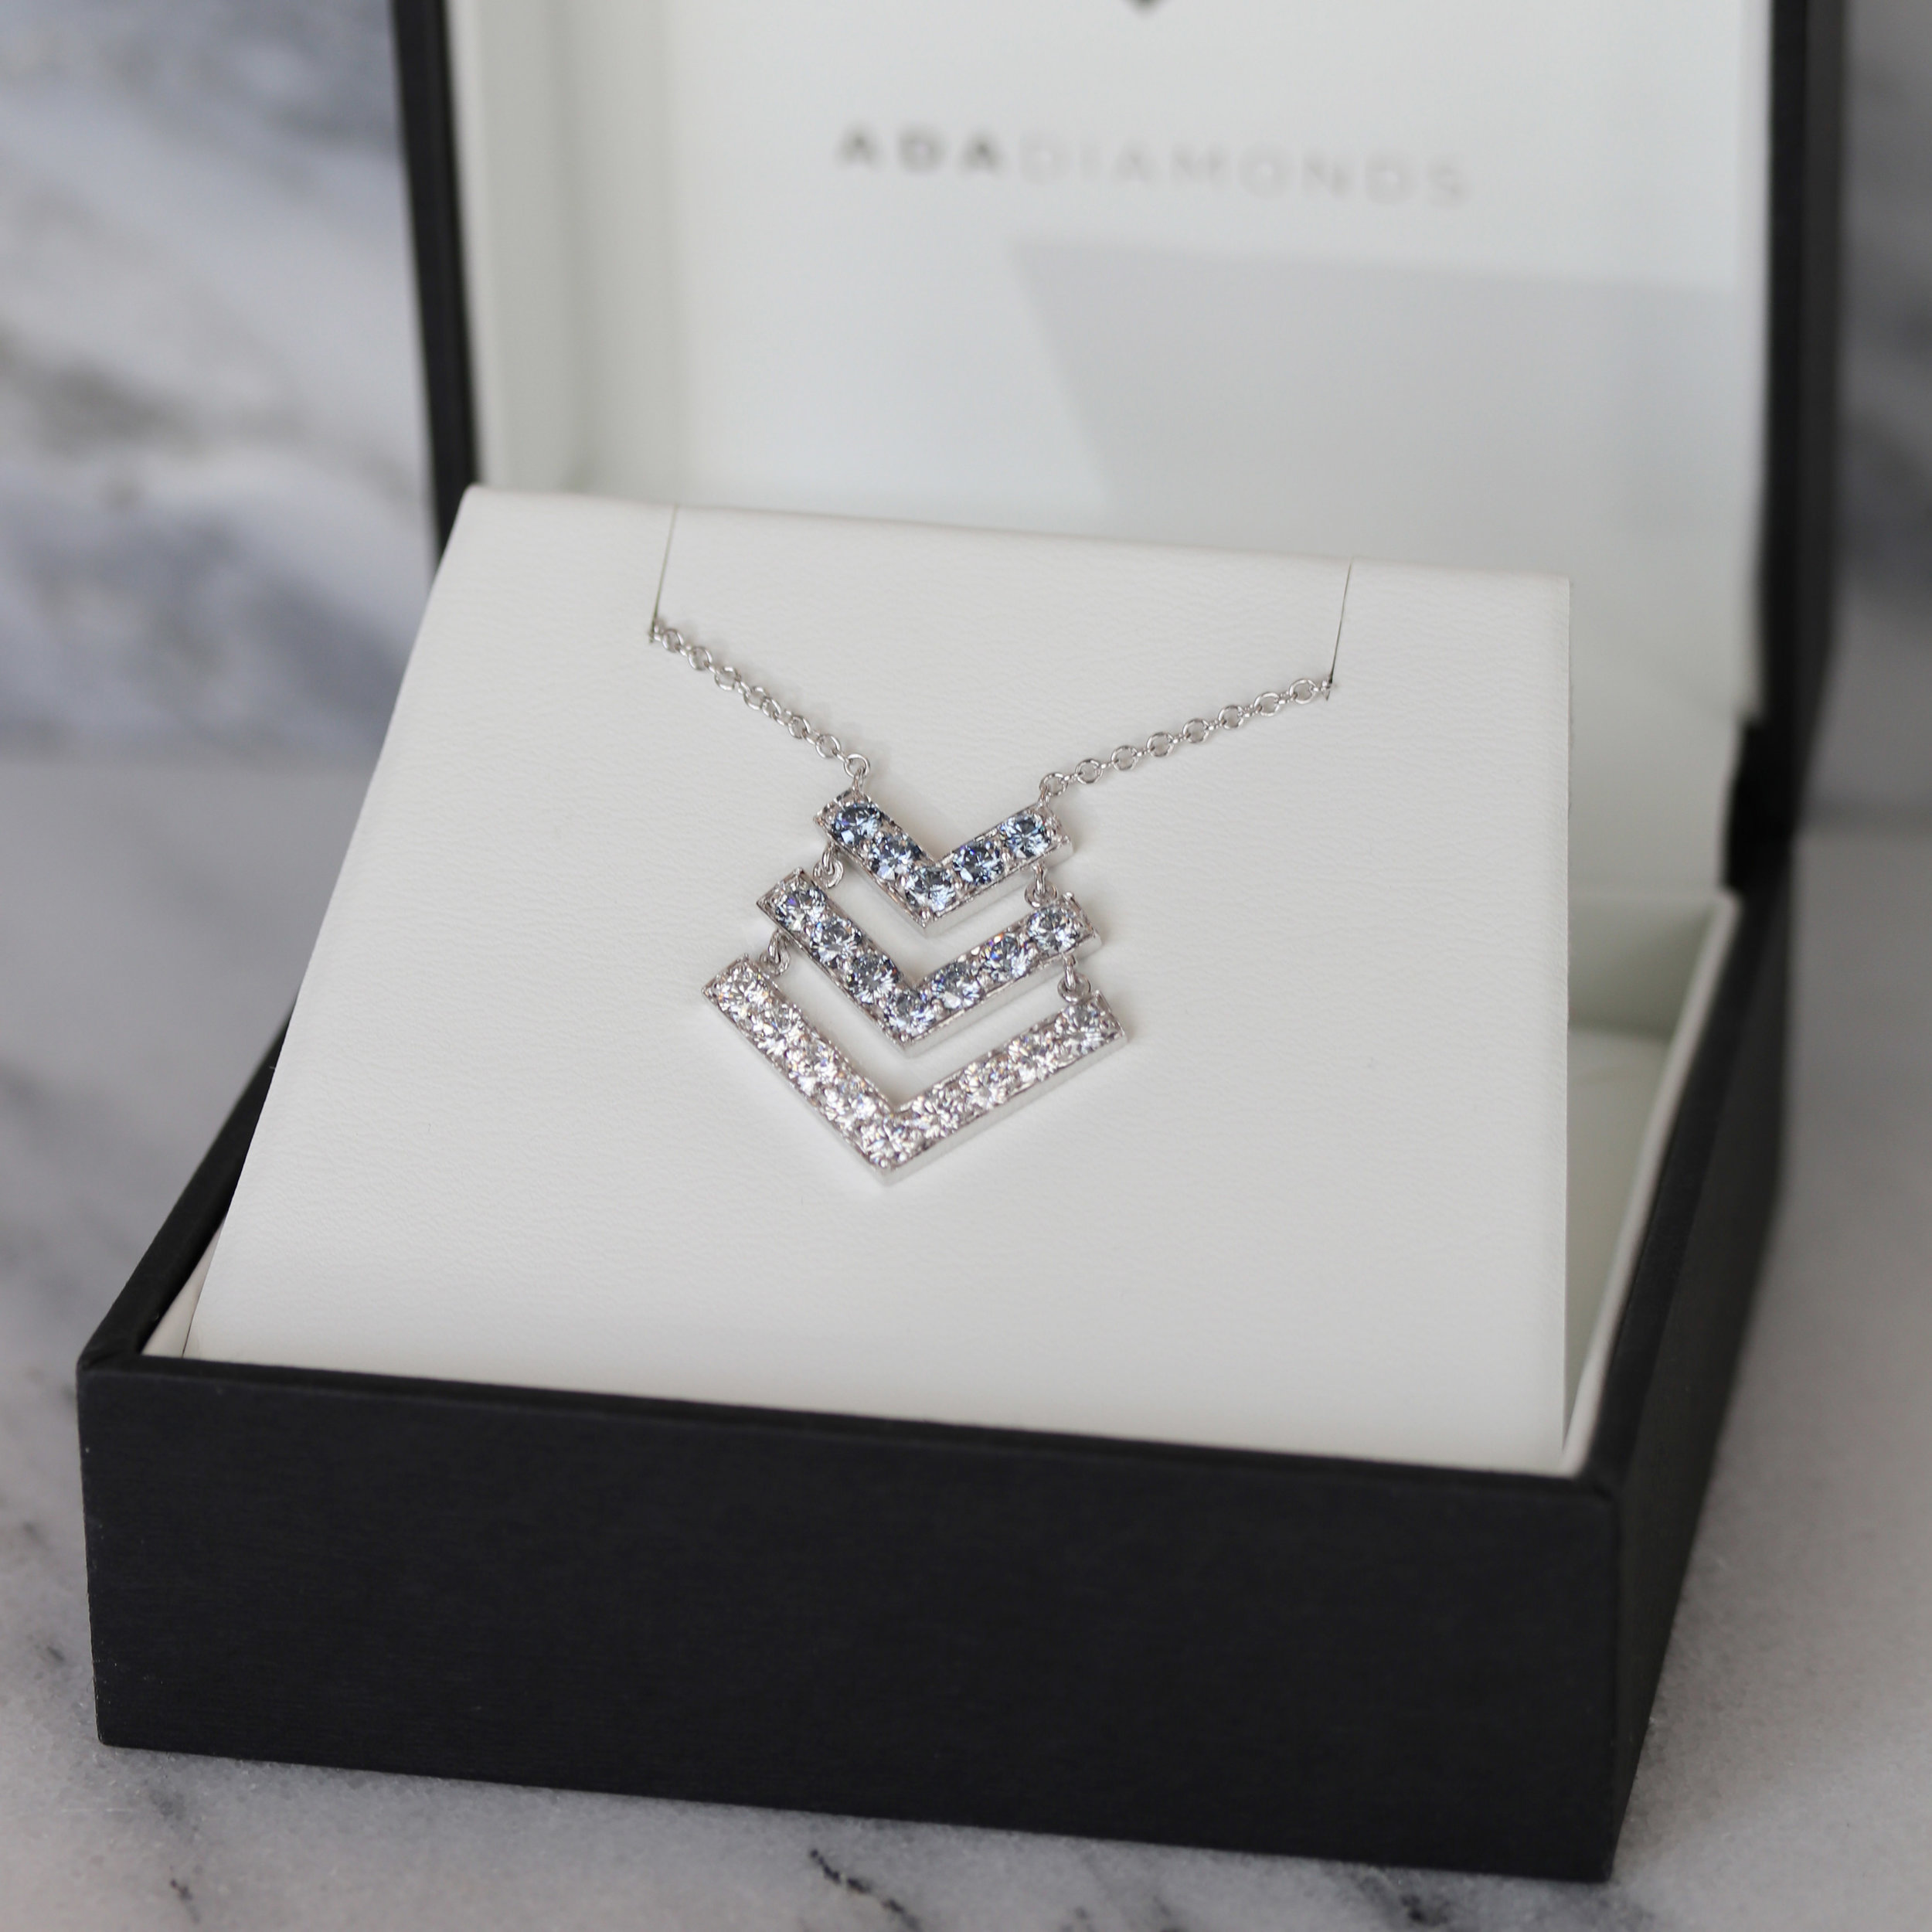 Fancy Blue and Colorless Lab Diamond Heavenly Halo Pendant Ada Diamonds AD-013